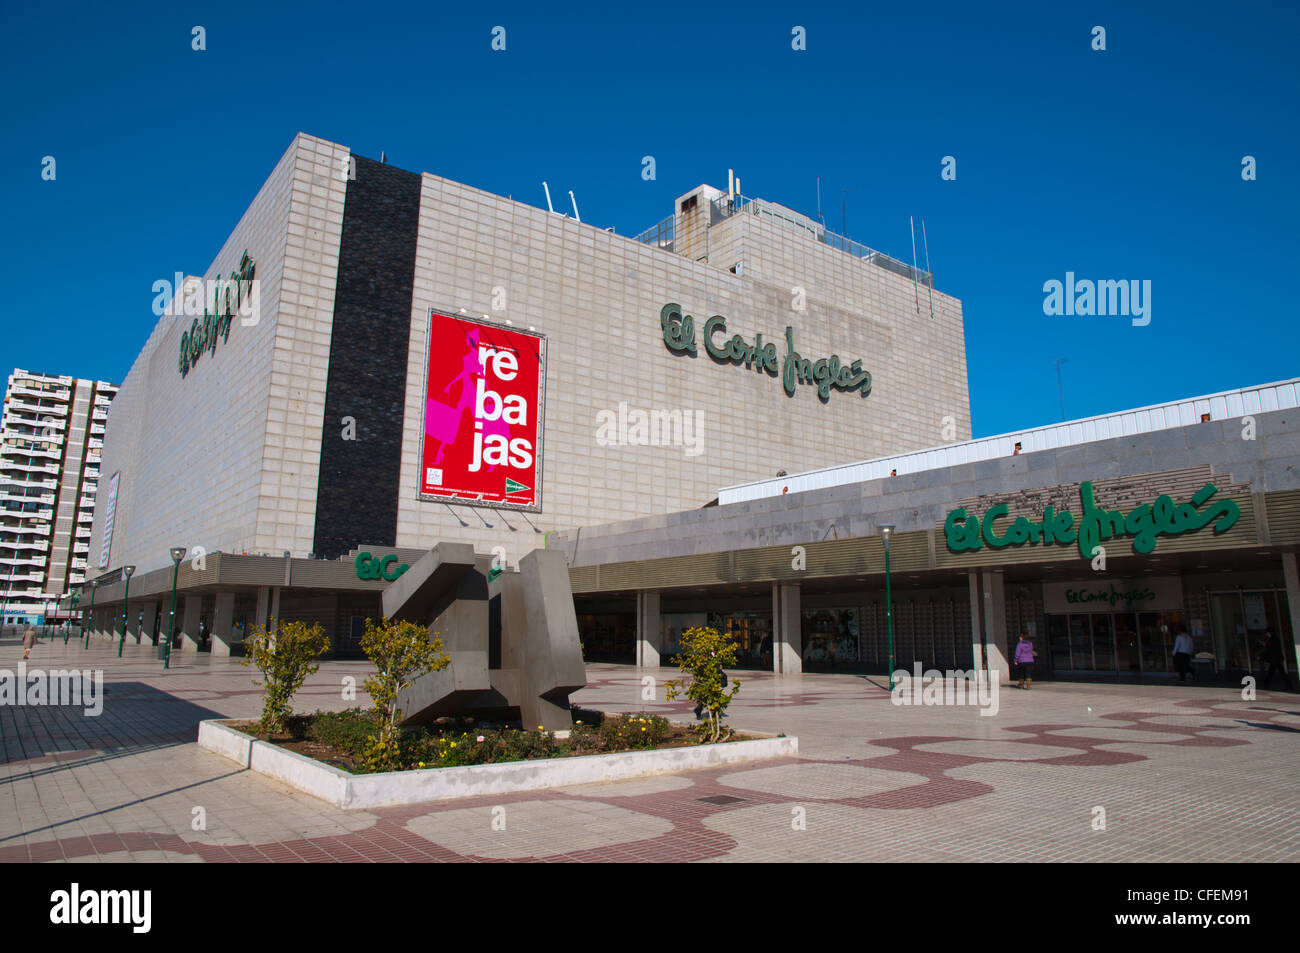 El Corte Ingles Kaufhaus Mitteleuropa Malaga Andalusien Spanien Stockbild